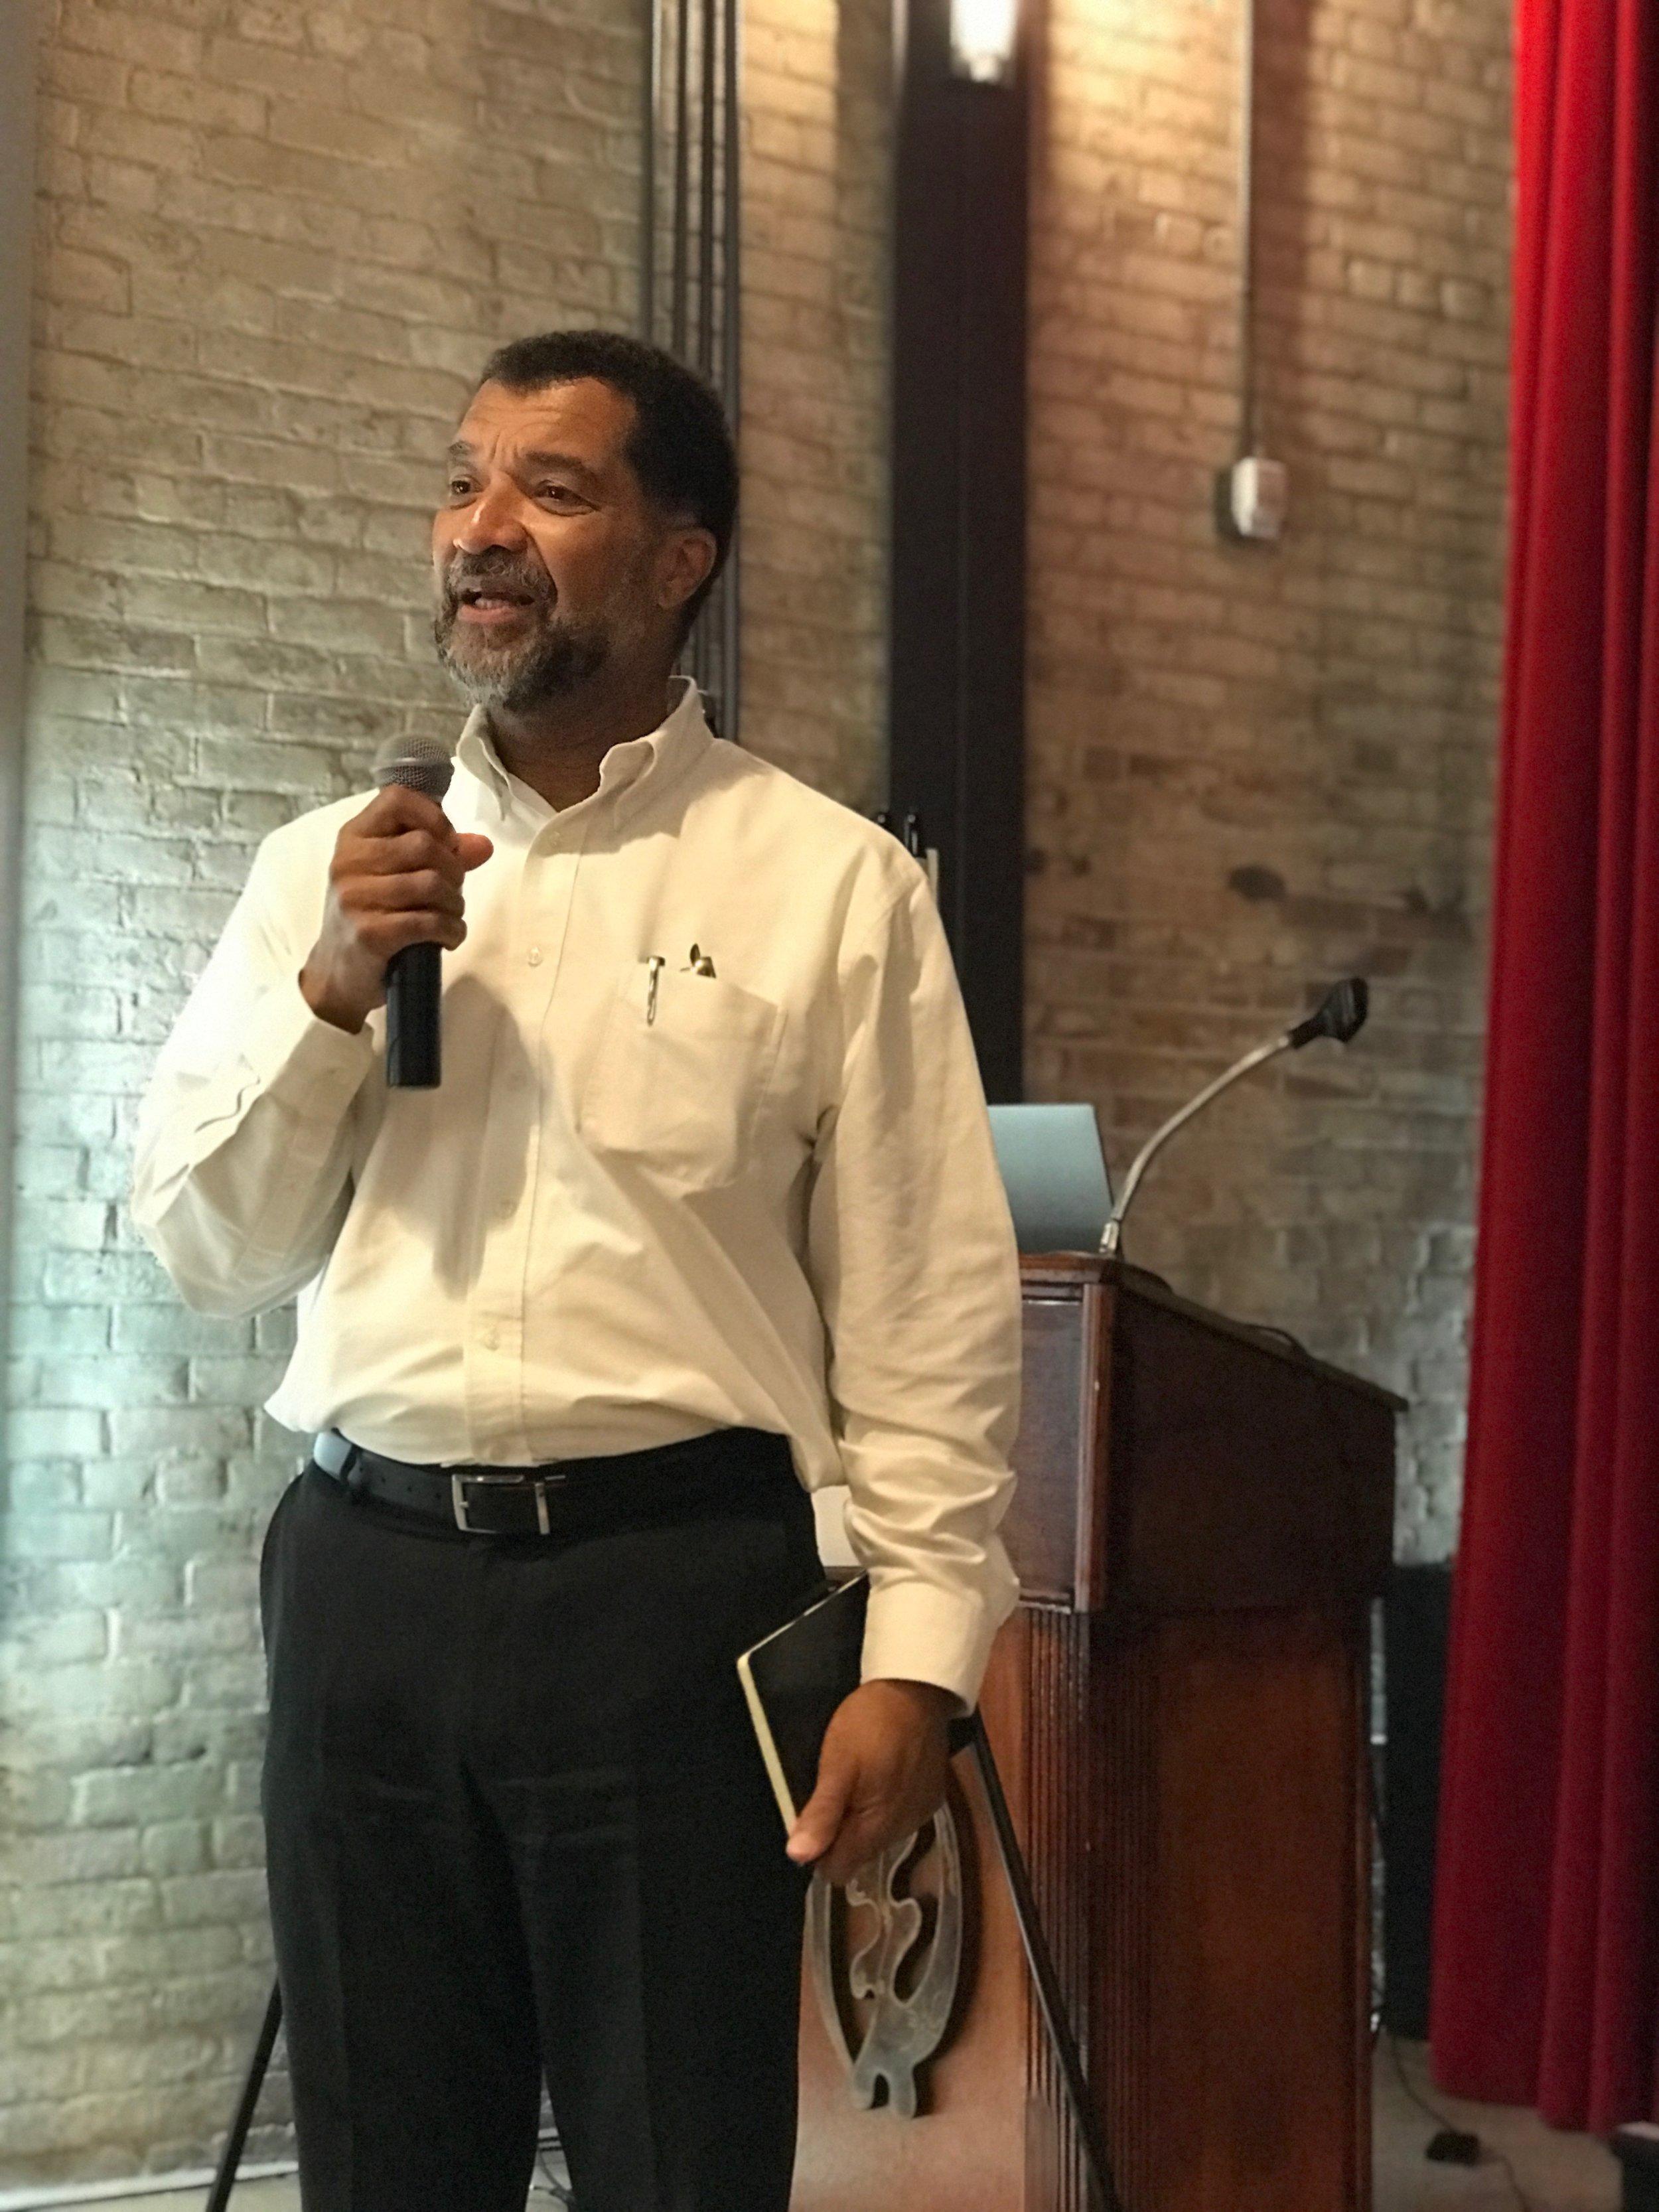 Bill Bates speaking at the 2018 Design Justice Summit